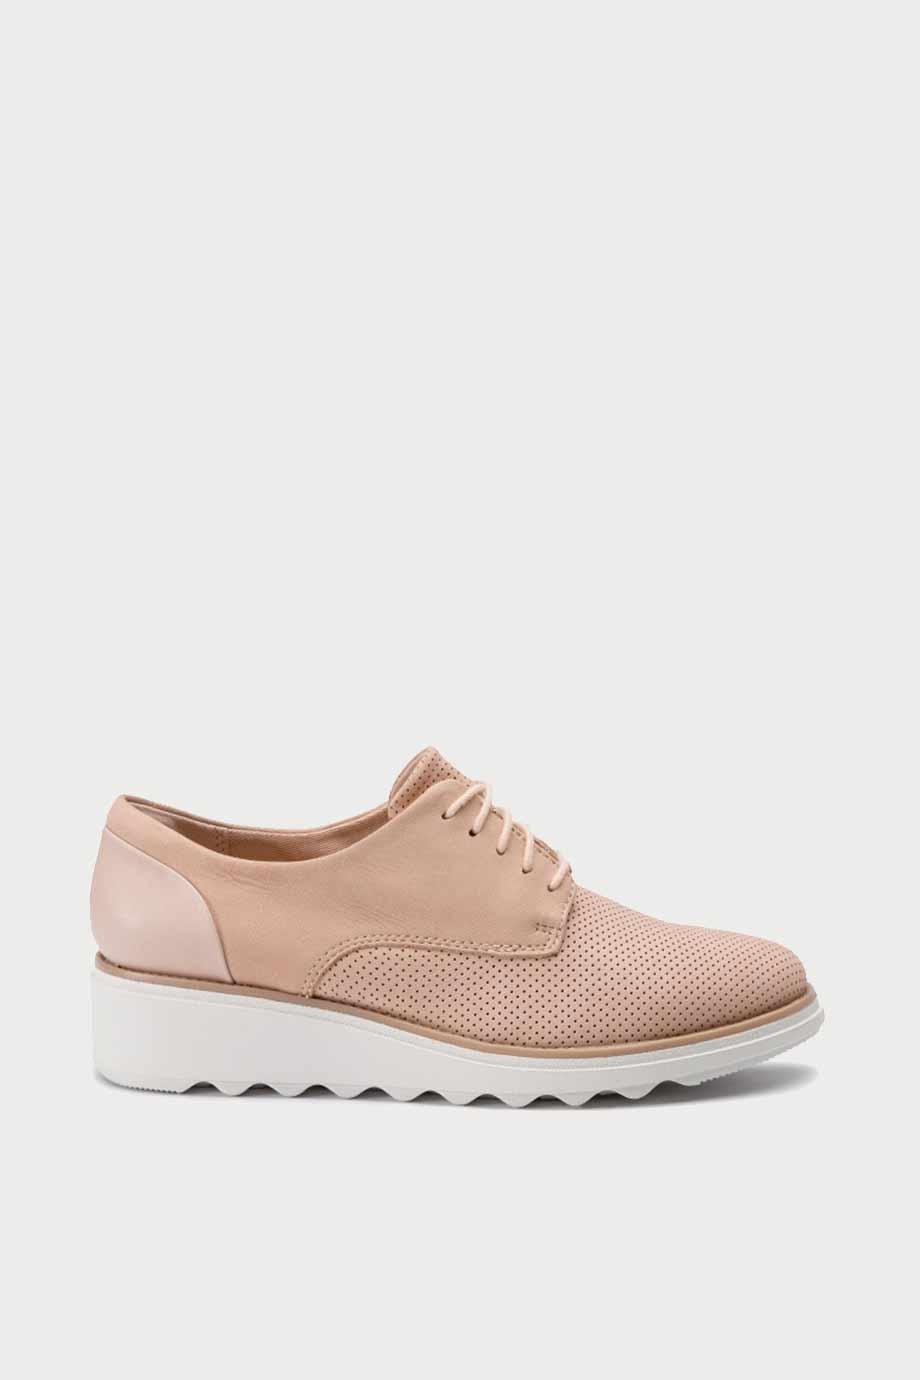 spiridoula metheniti shoes xalkida p Sharon Crystal clarks blush nubuck 2